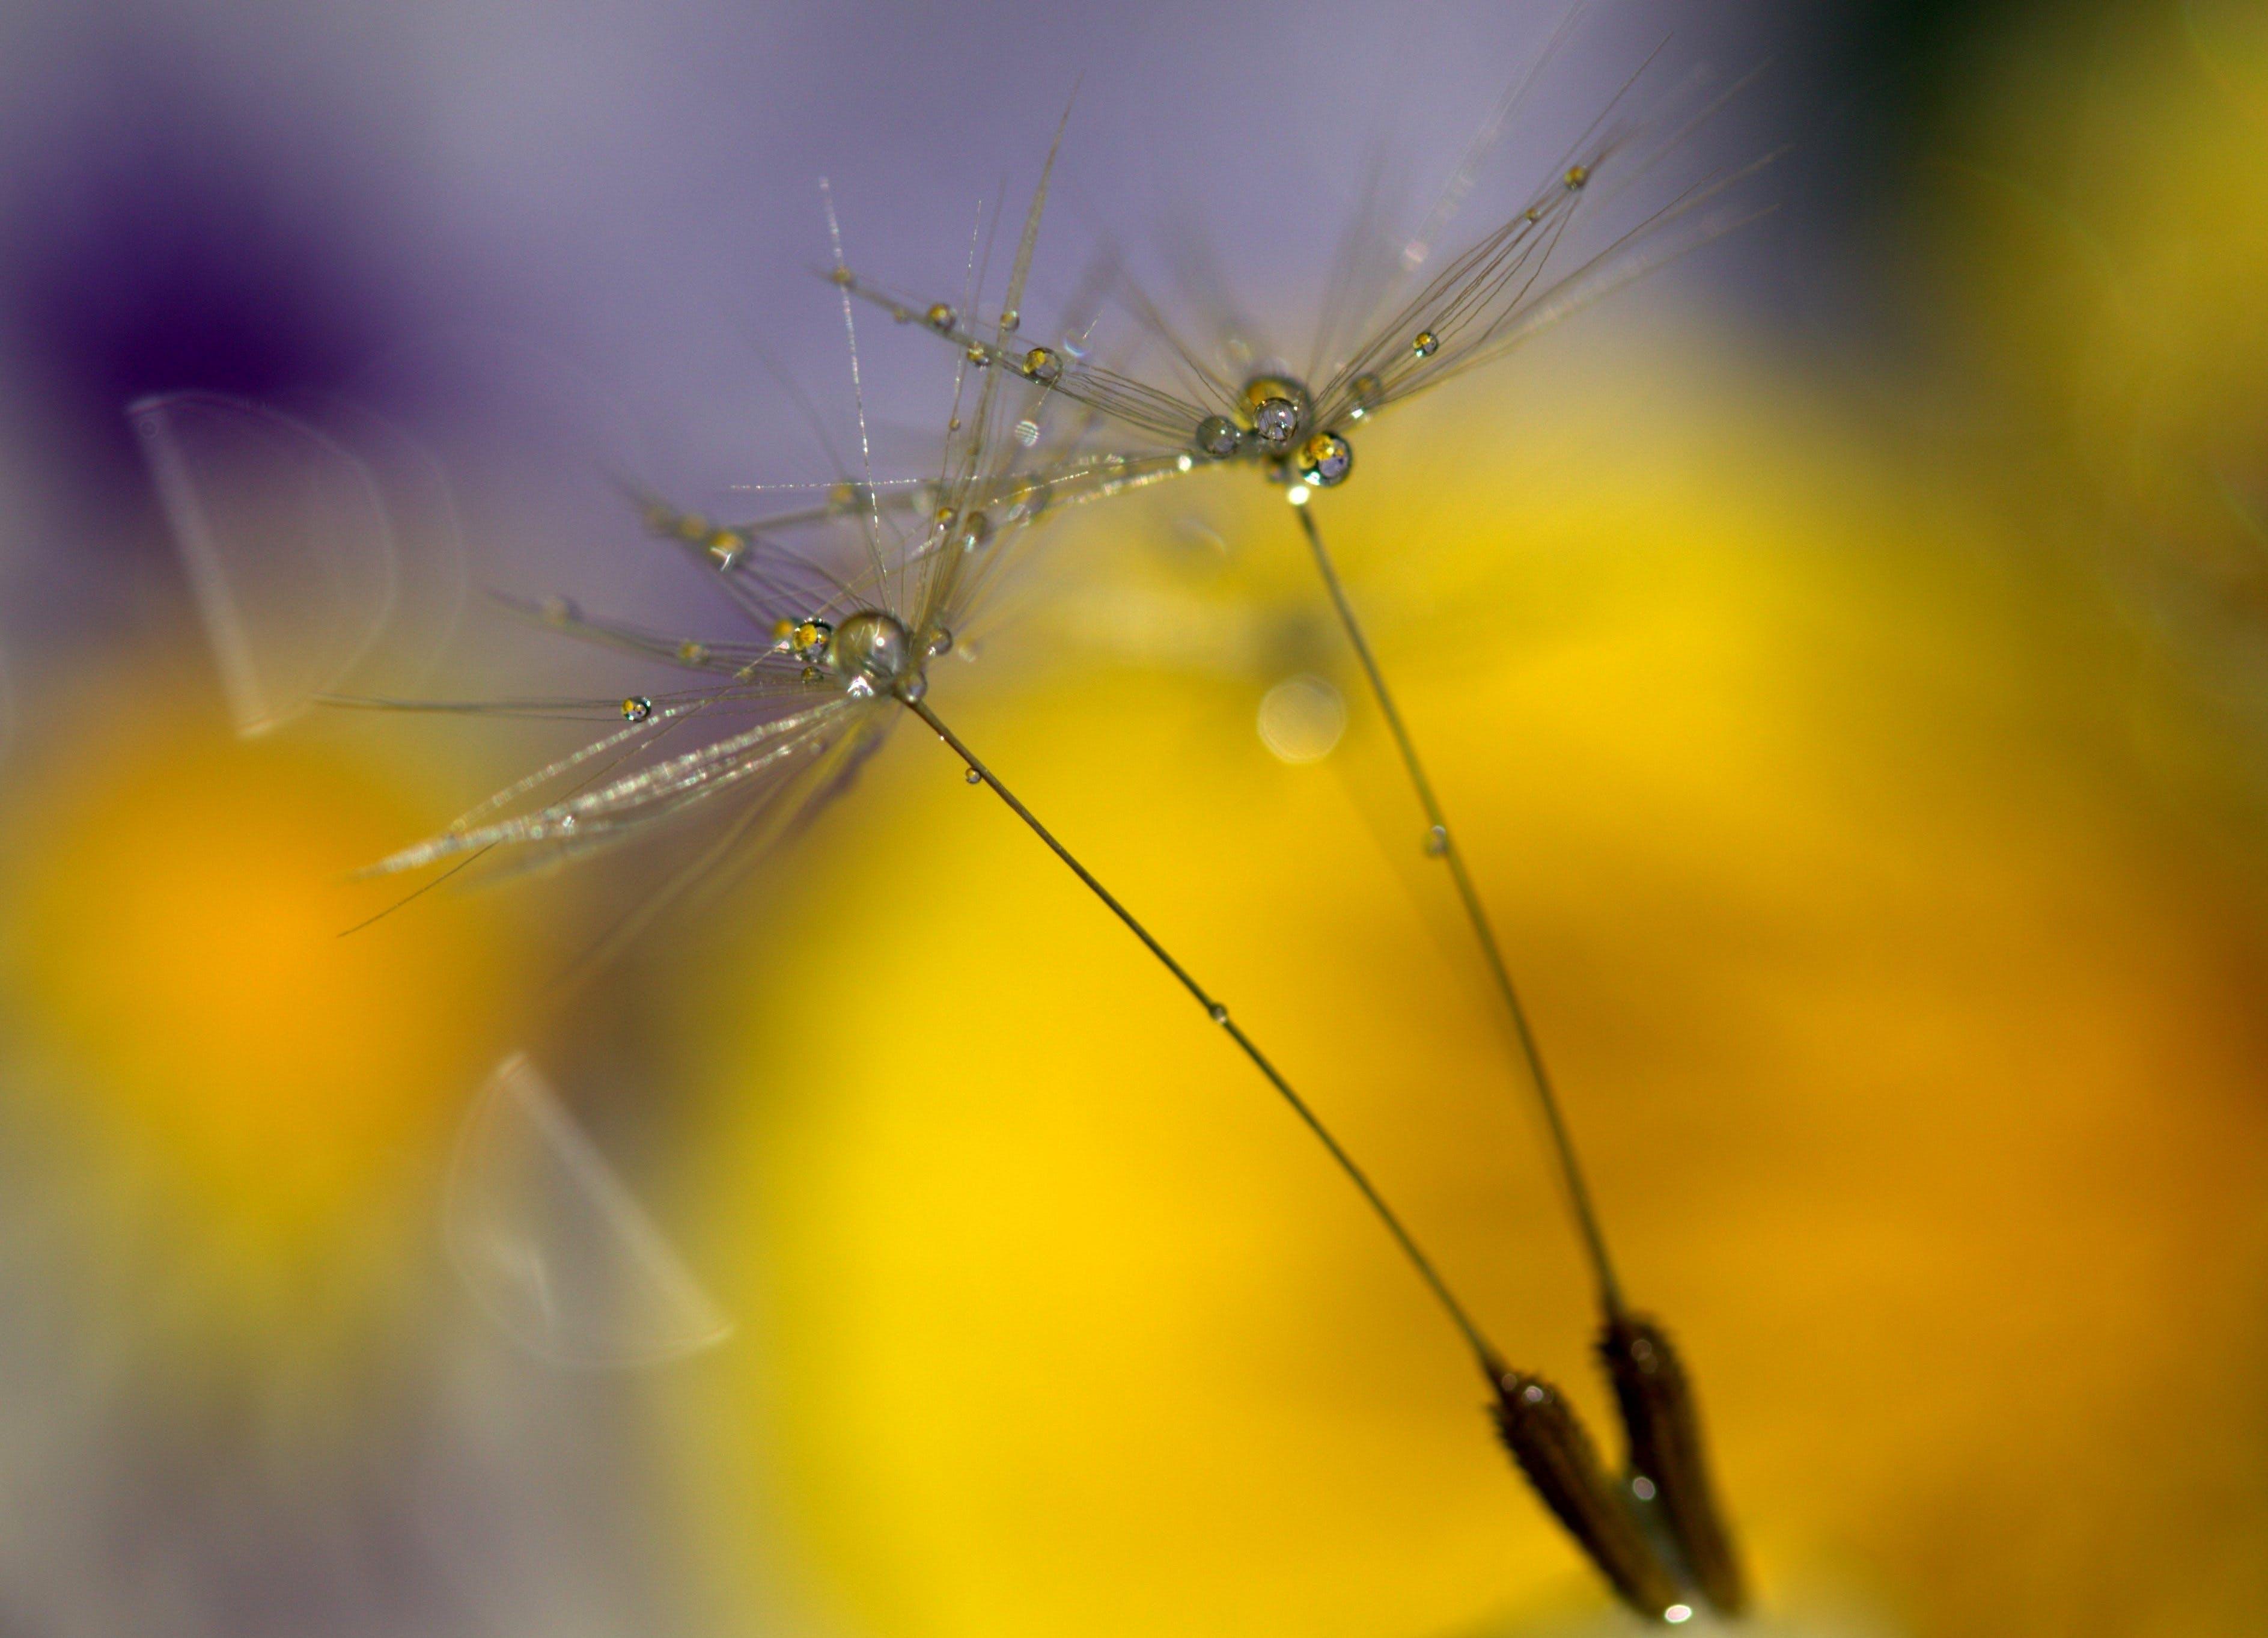 close-up, dandelion, delicate